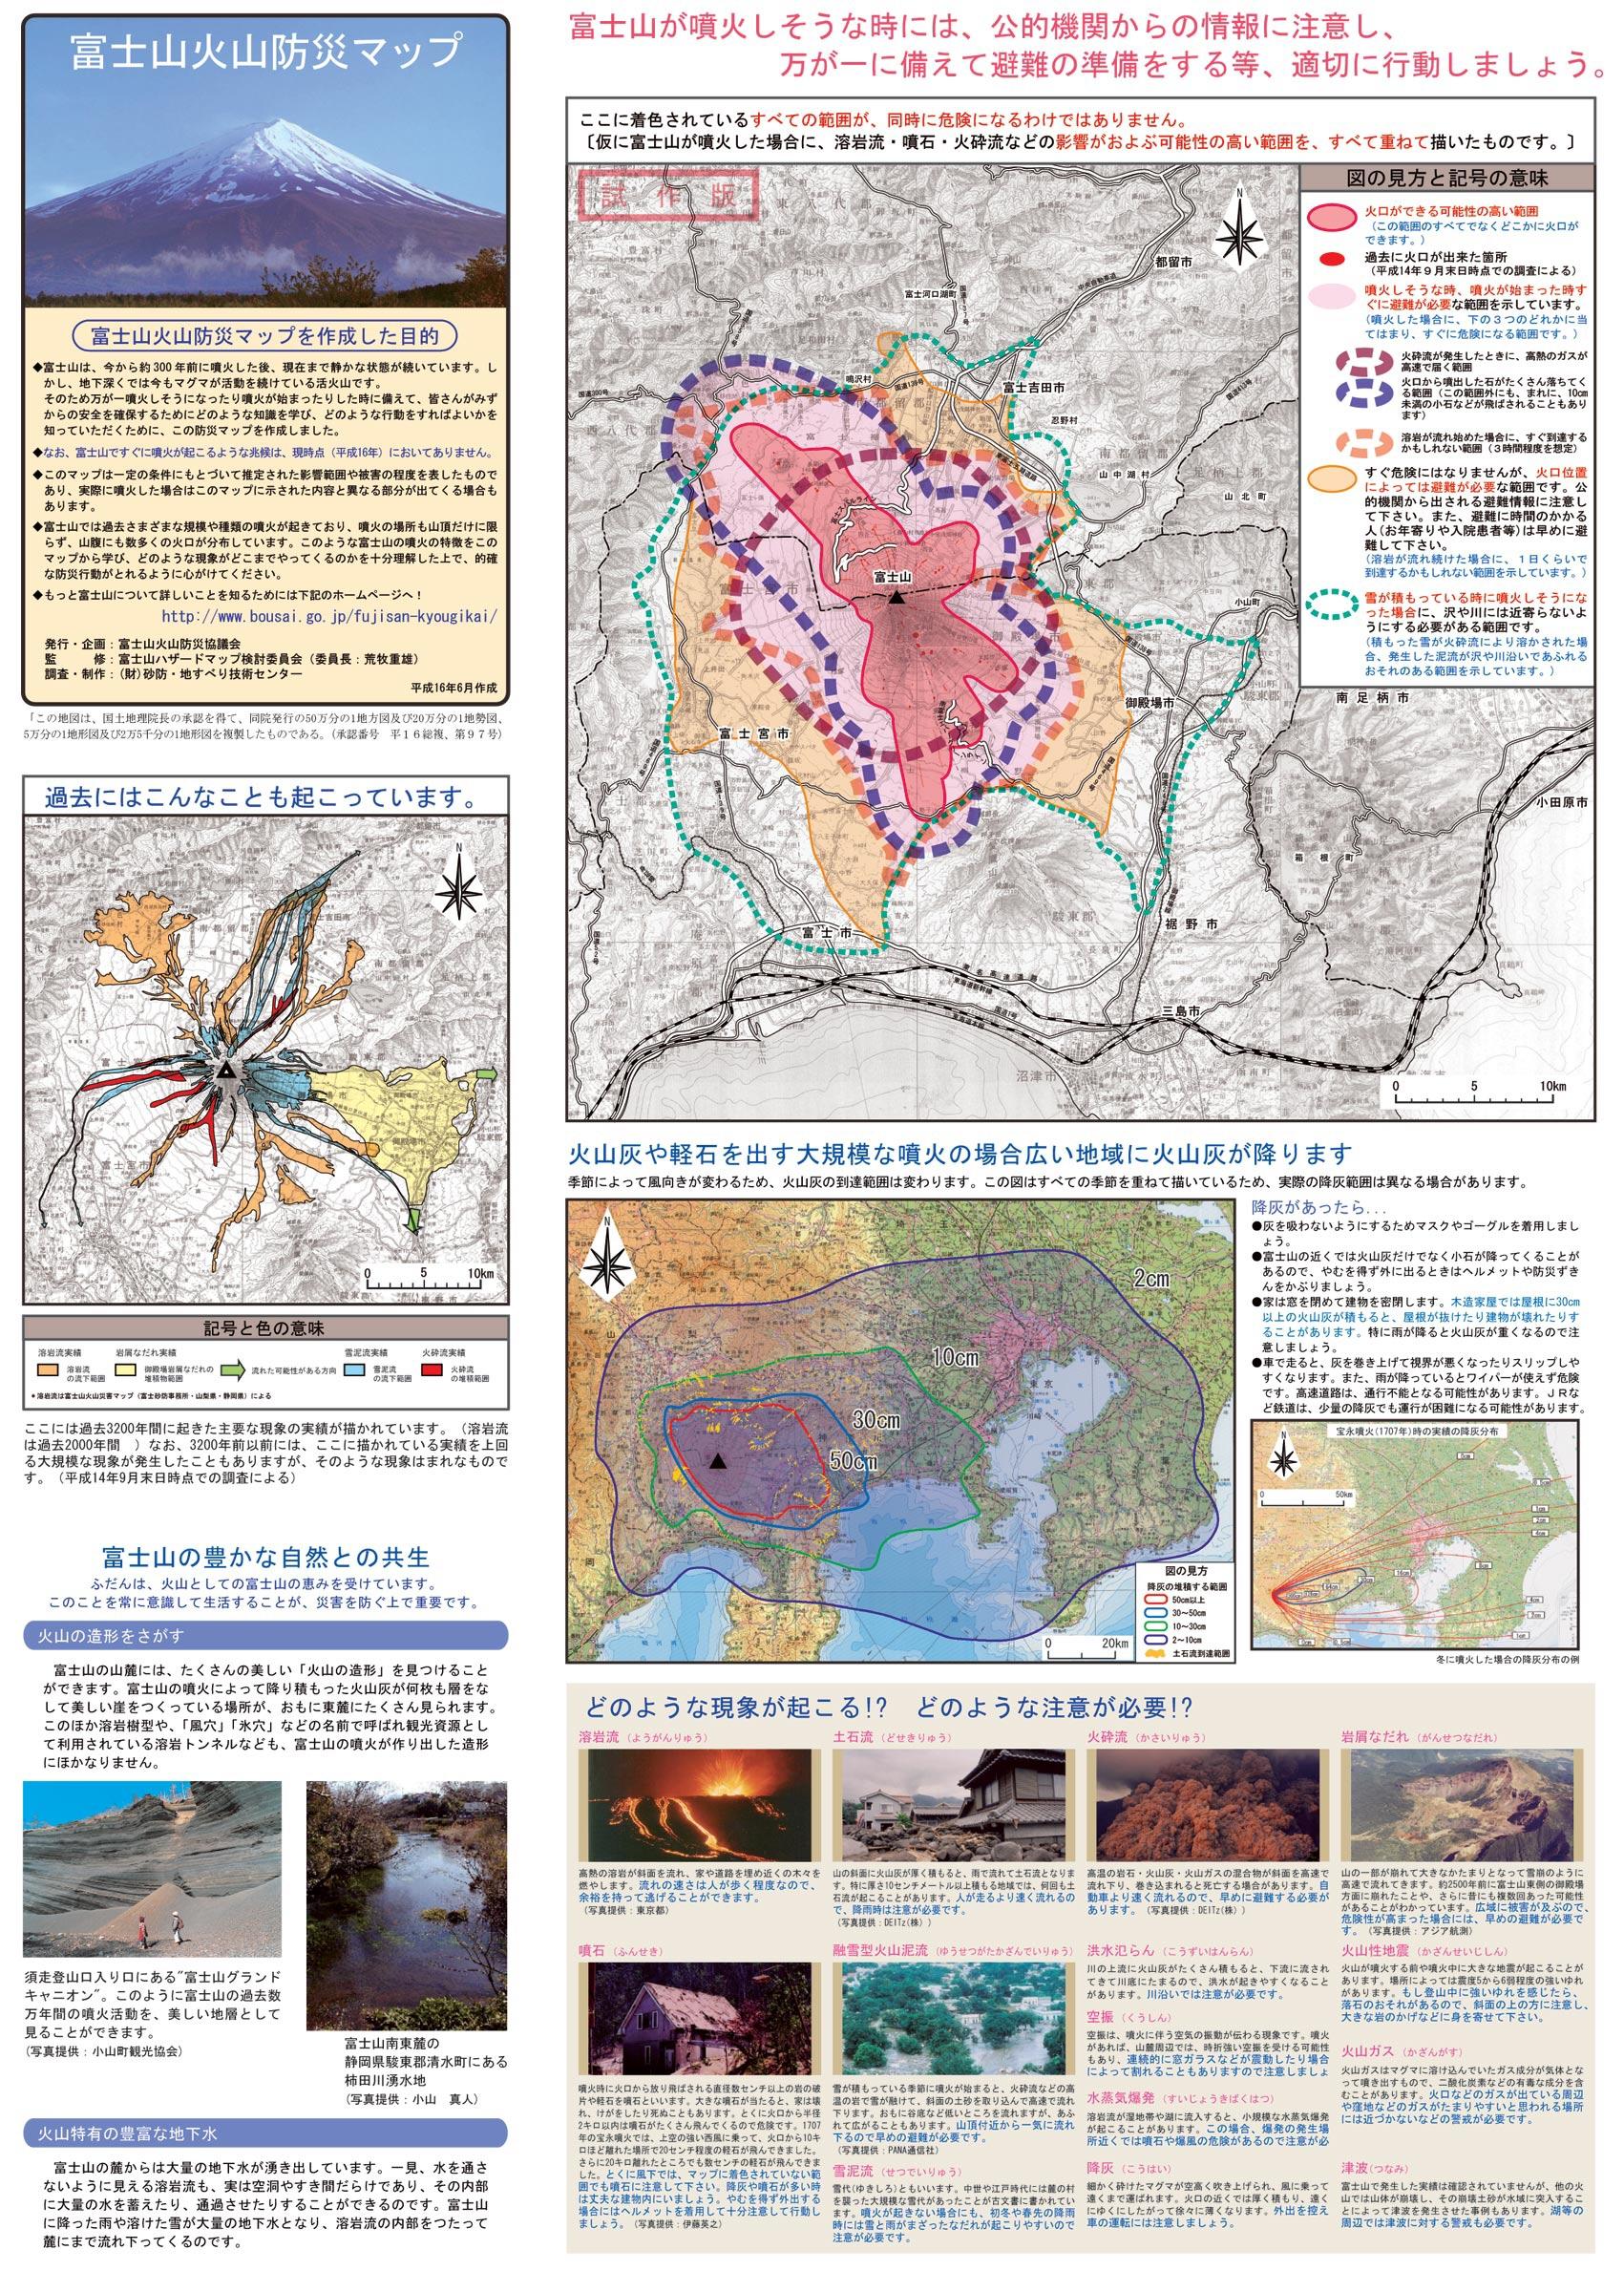 Mt Fuji Japans Sacred Volcano Rocky Planet Rocky Planet - Japan map mount fuji